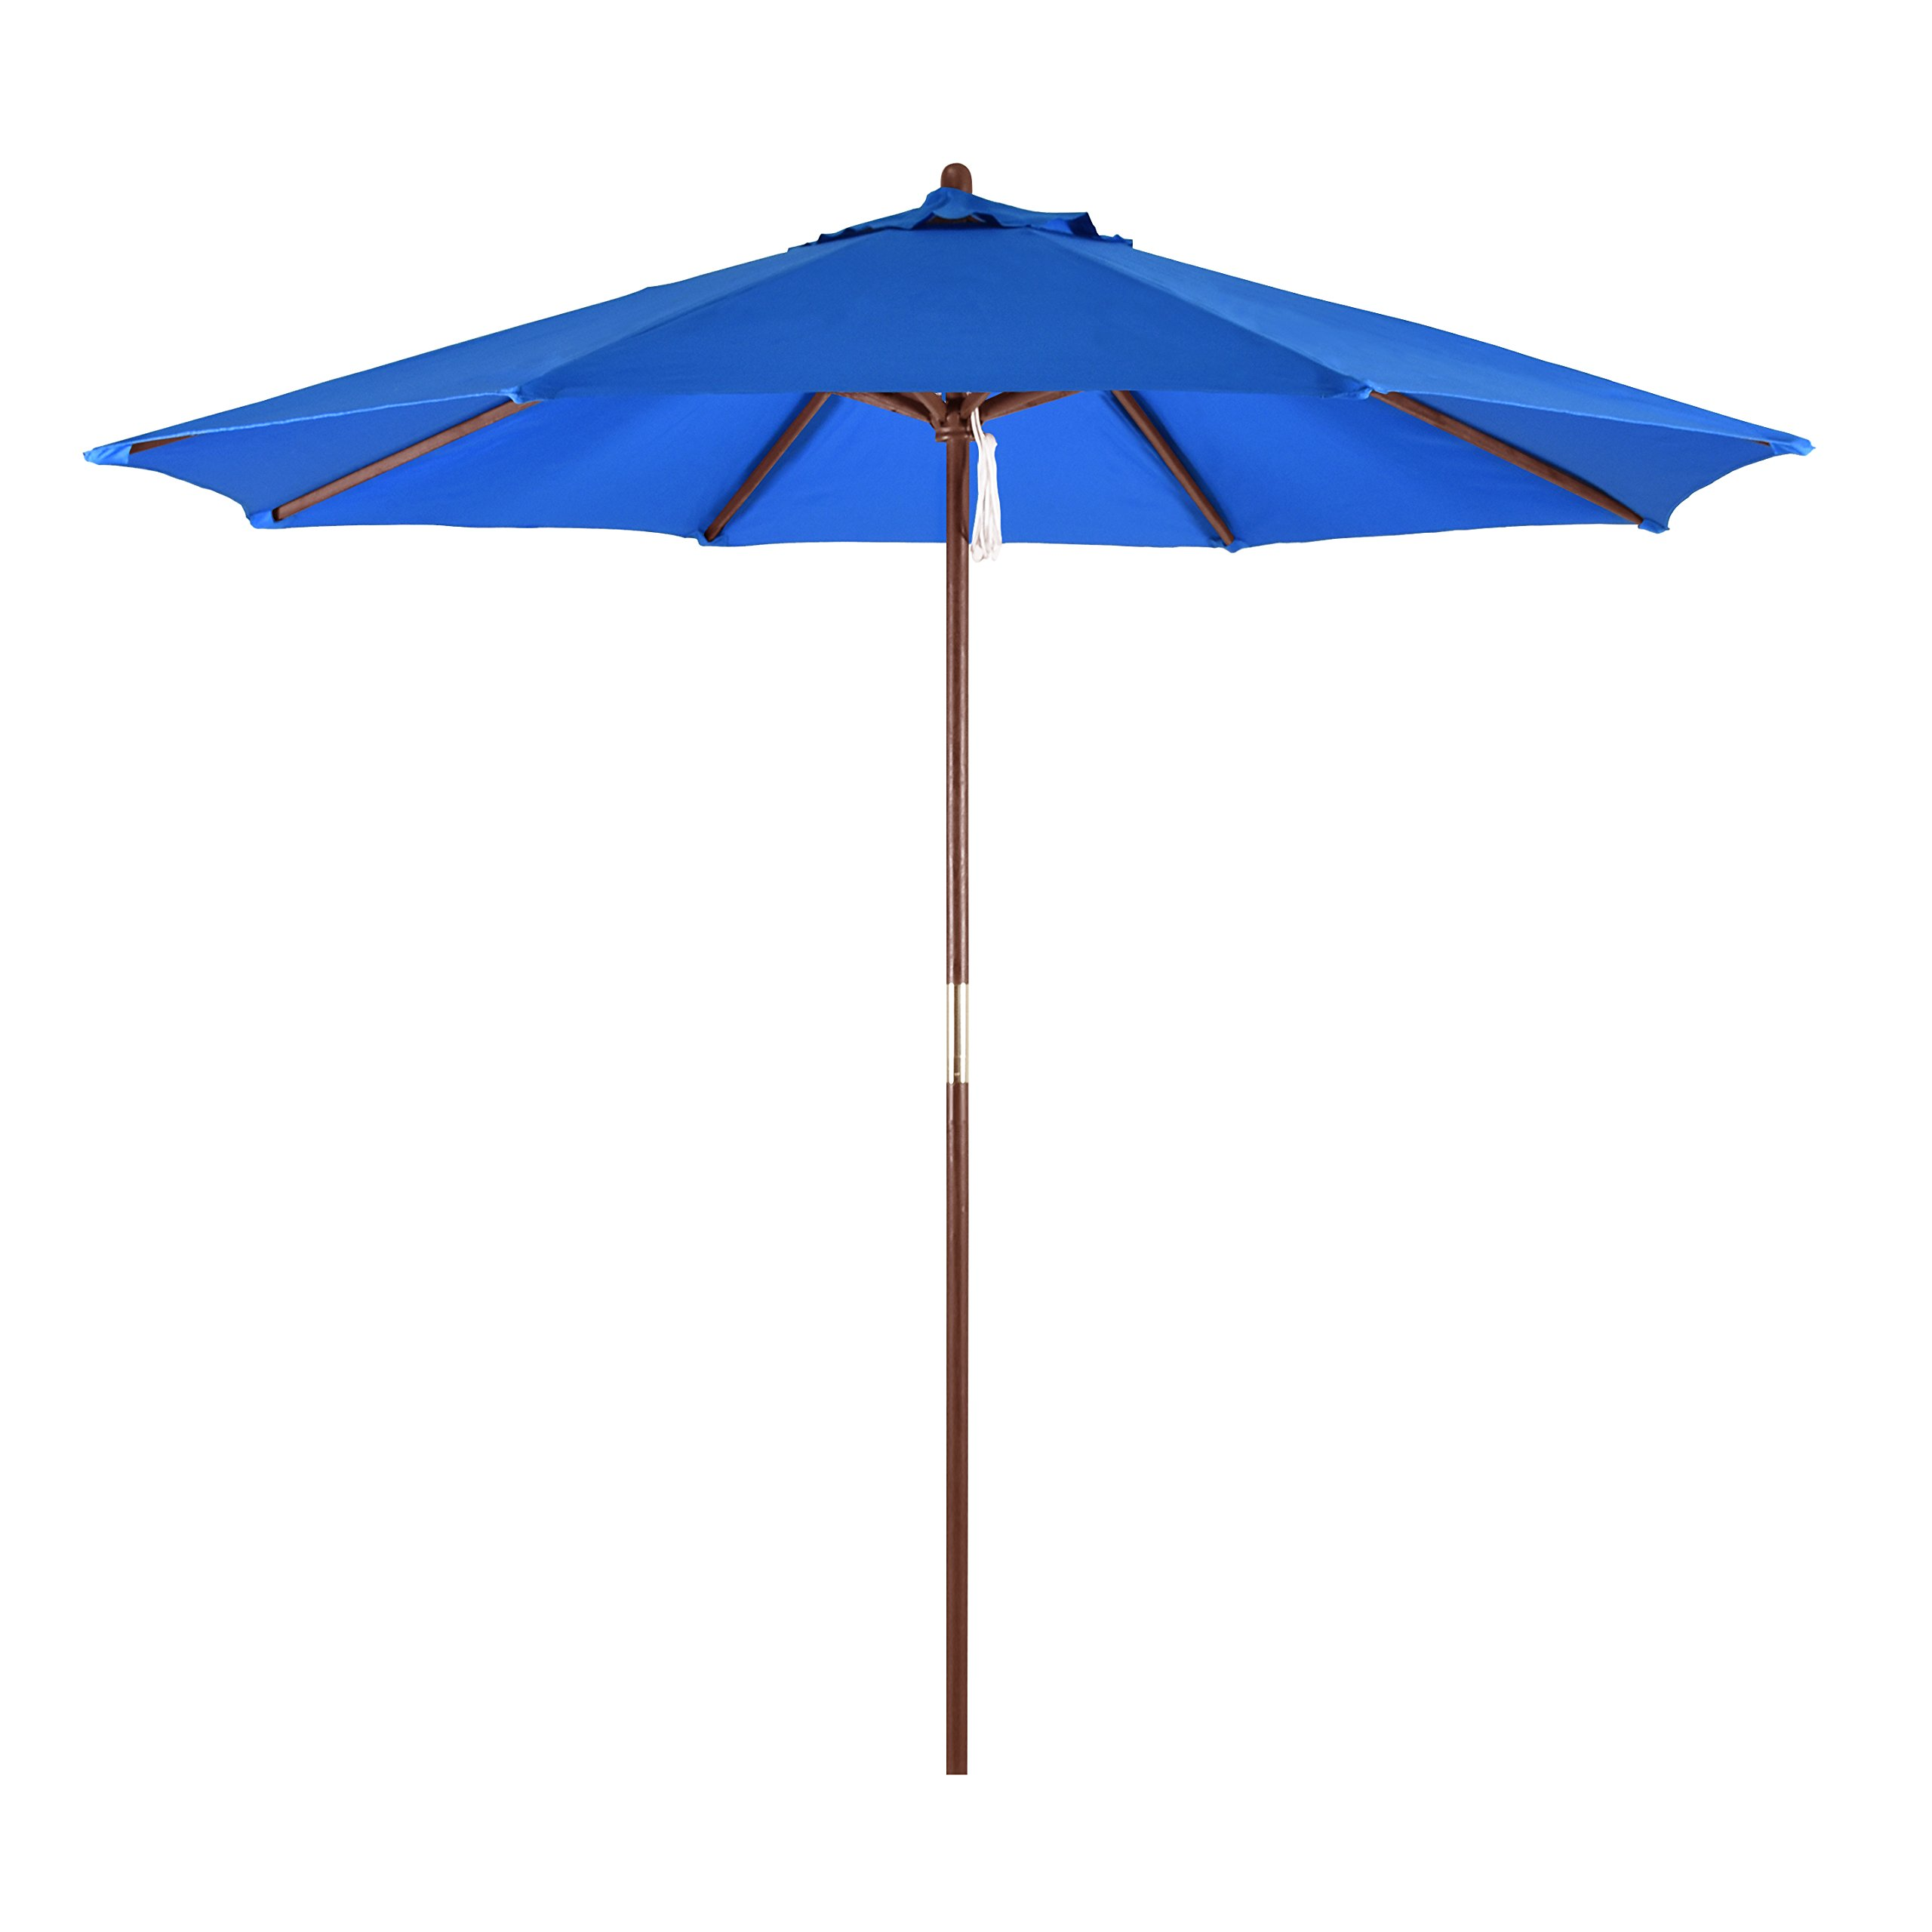 California Umbrella 9' Round Hardwood Frame Market Umbrella, Pulley Lift, Polyester Pacific Blue